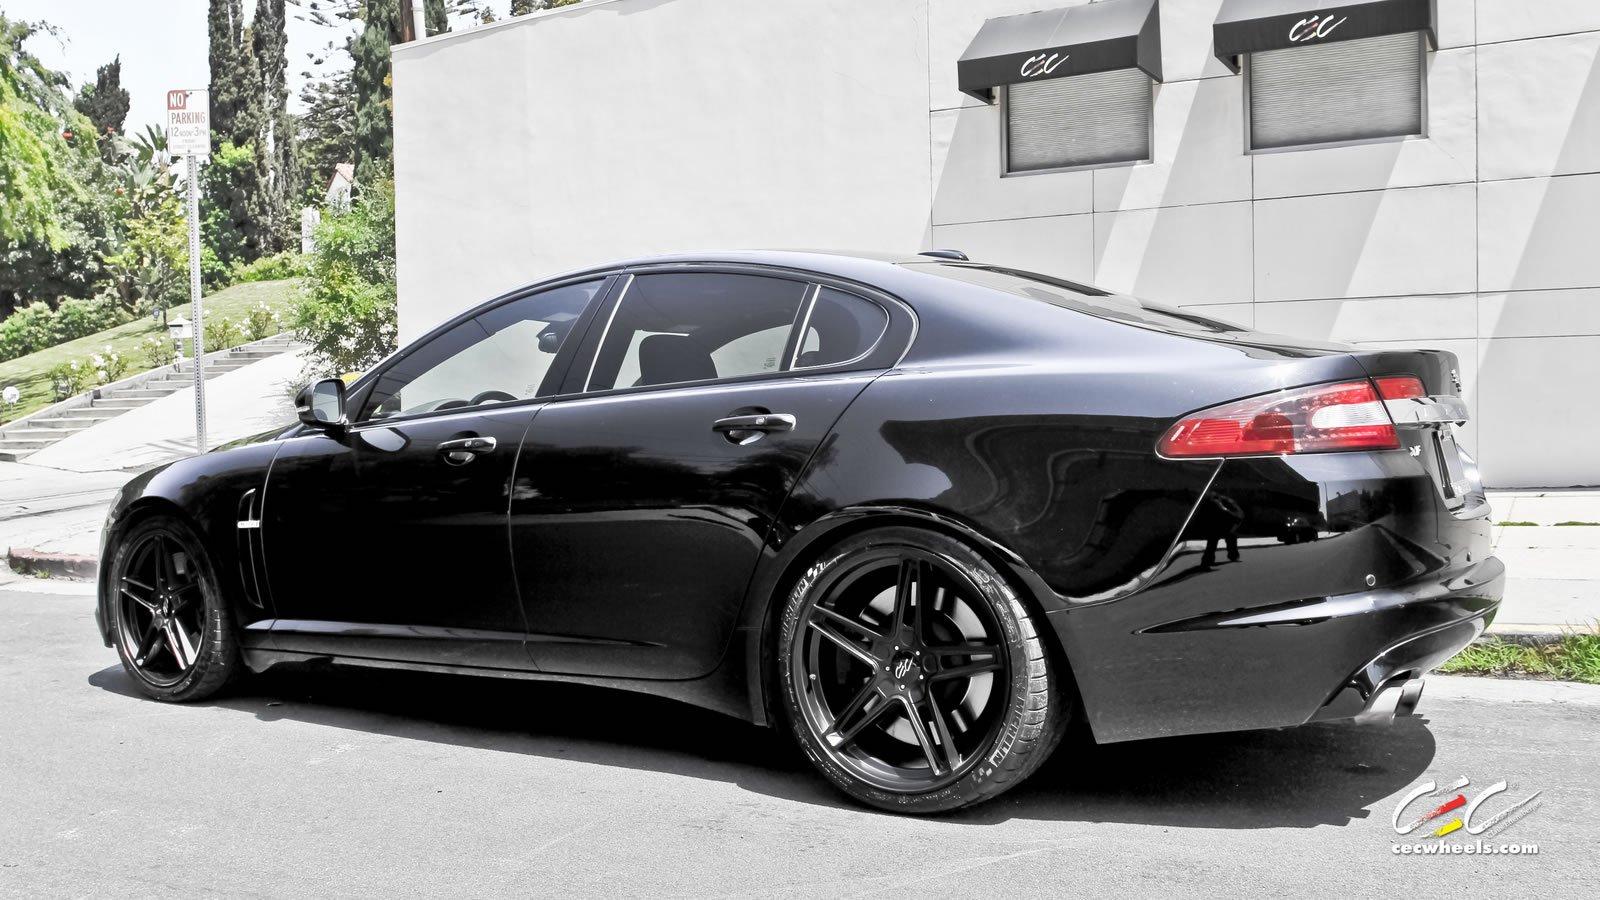 2015 cars cec jaguar xf sedan tuning wheels wallpaper. Black Bedroom Furniture Sets. Home Design Ideas